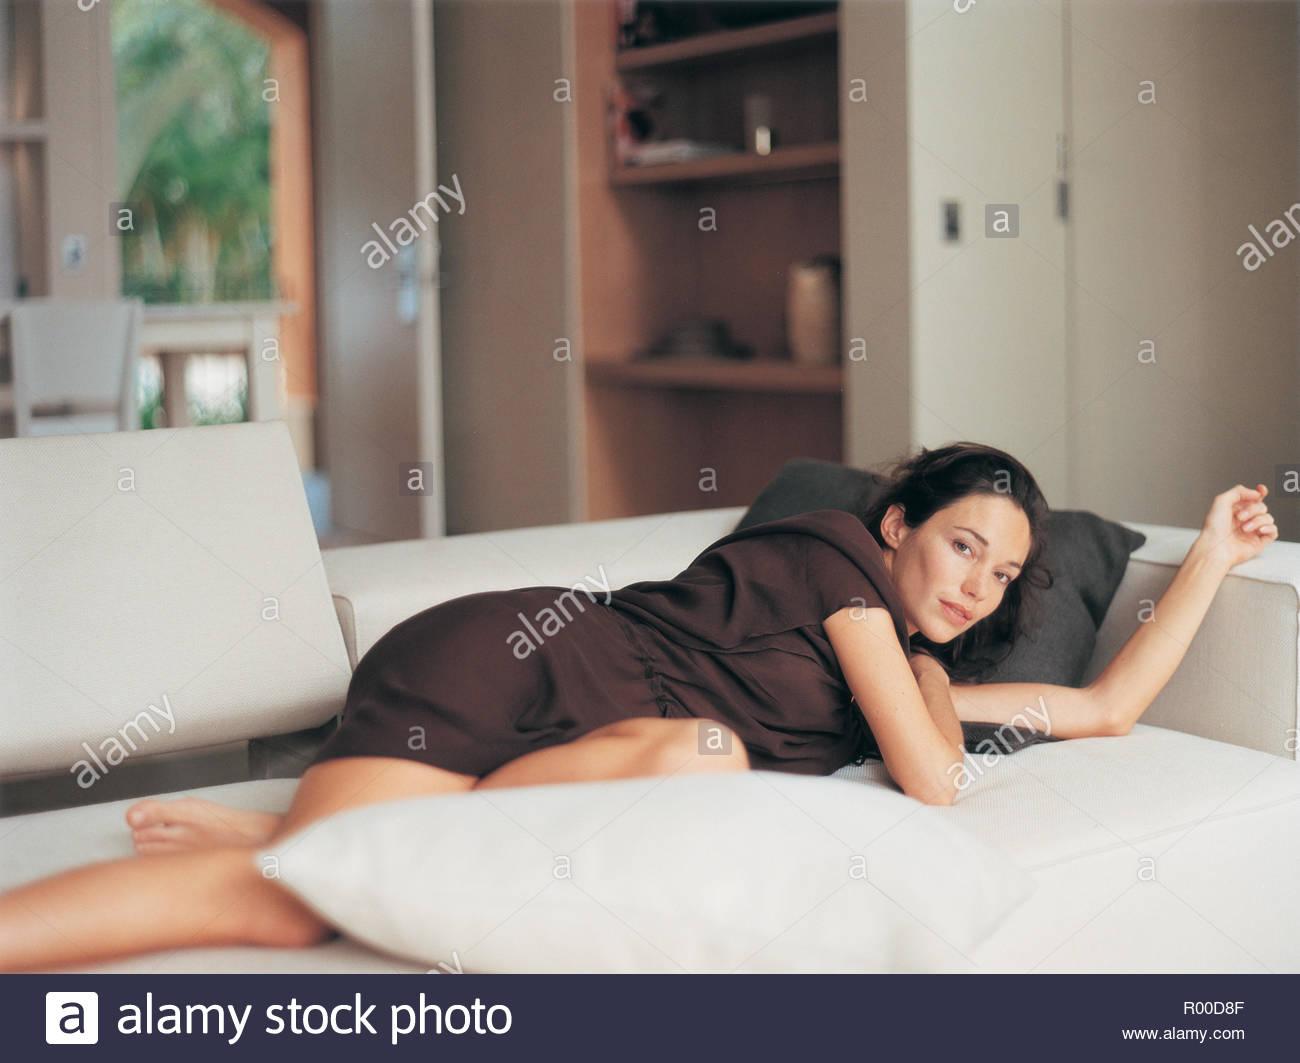 Woman wearing brown dress lying on sofa bed - Stock Image